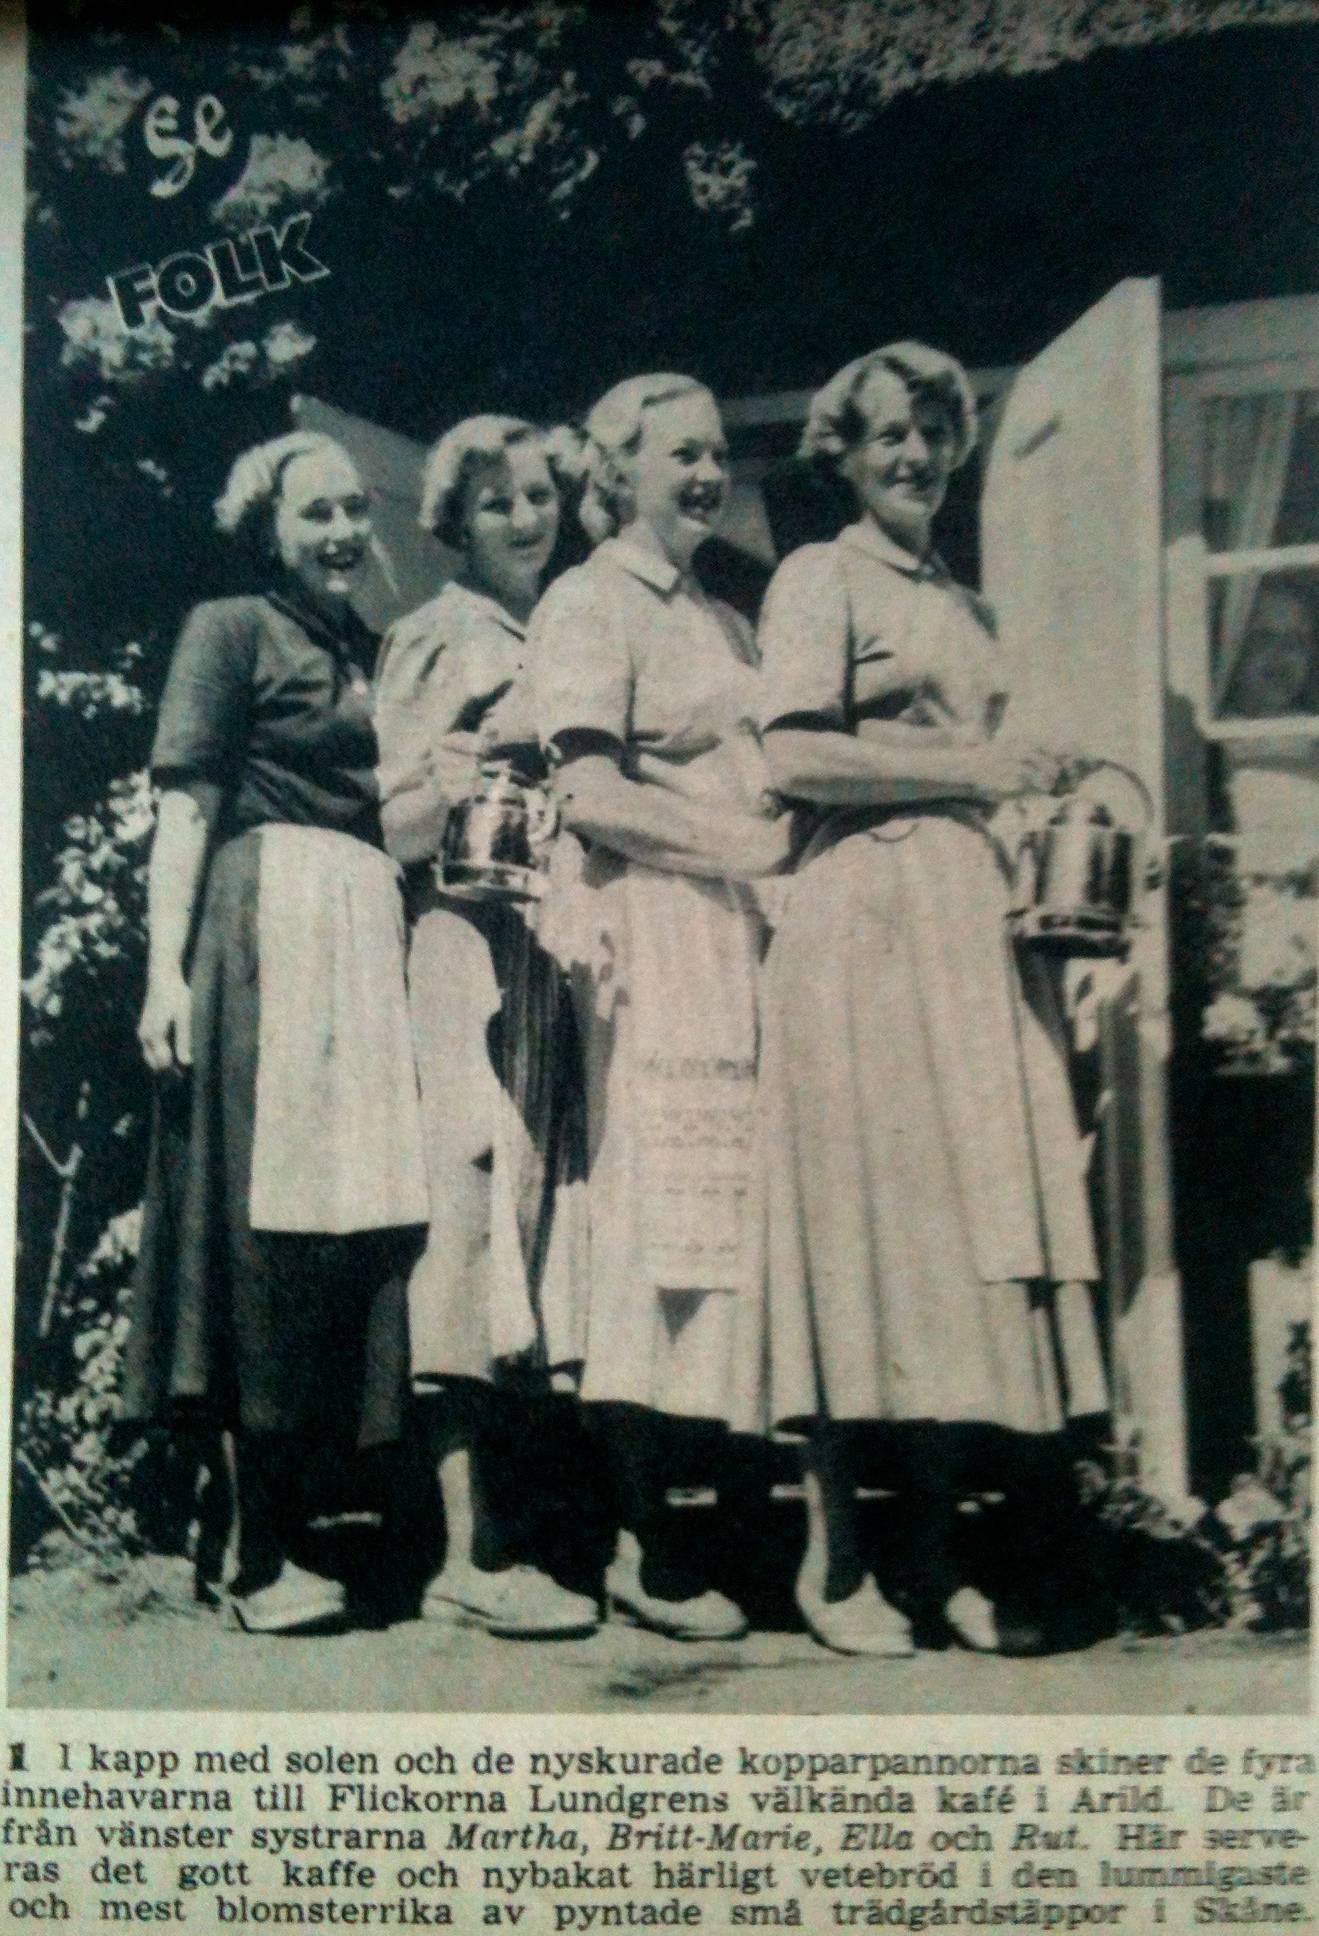 Flickorna Lundgren i Skaret 1950